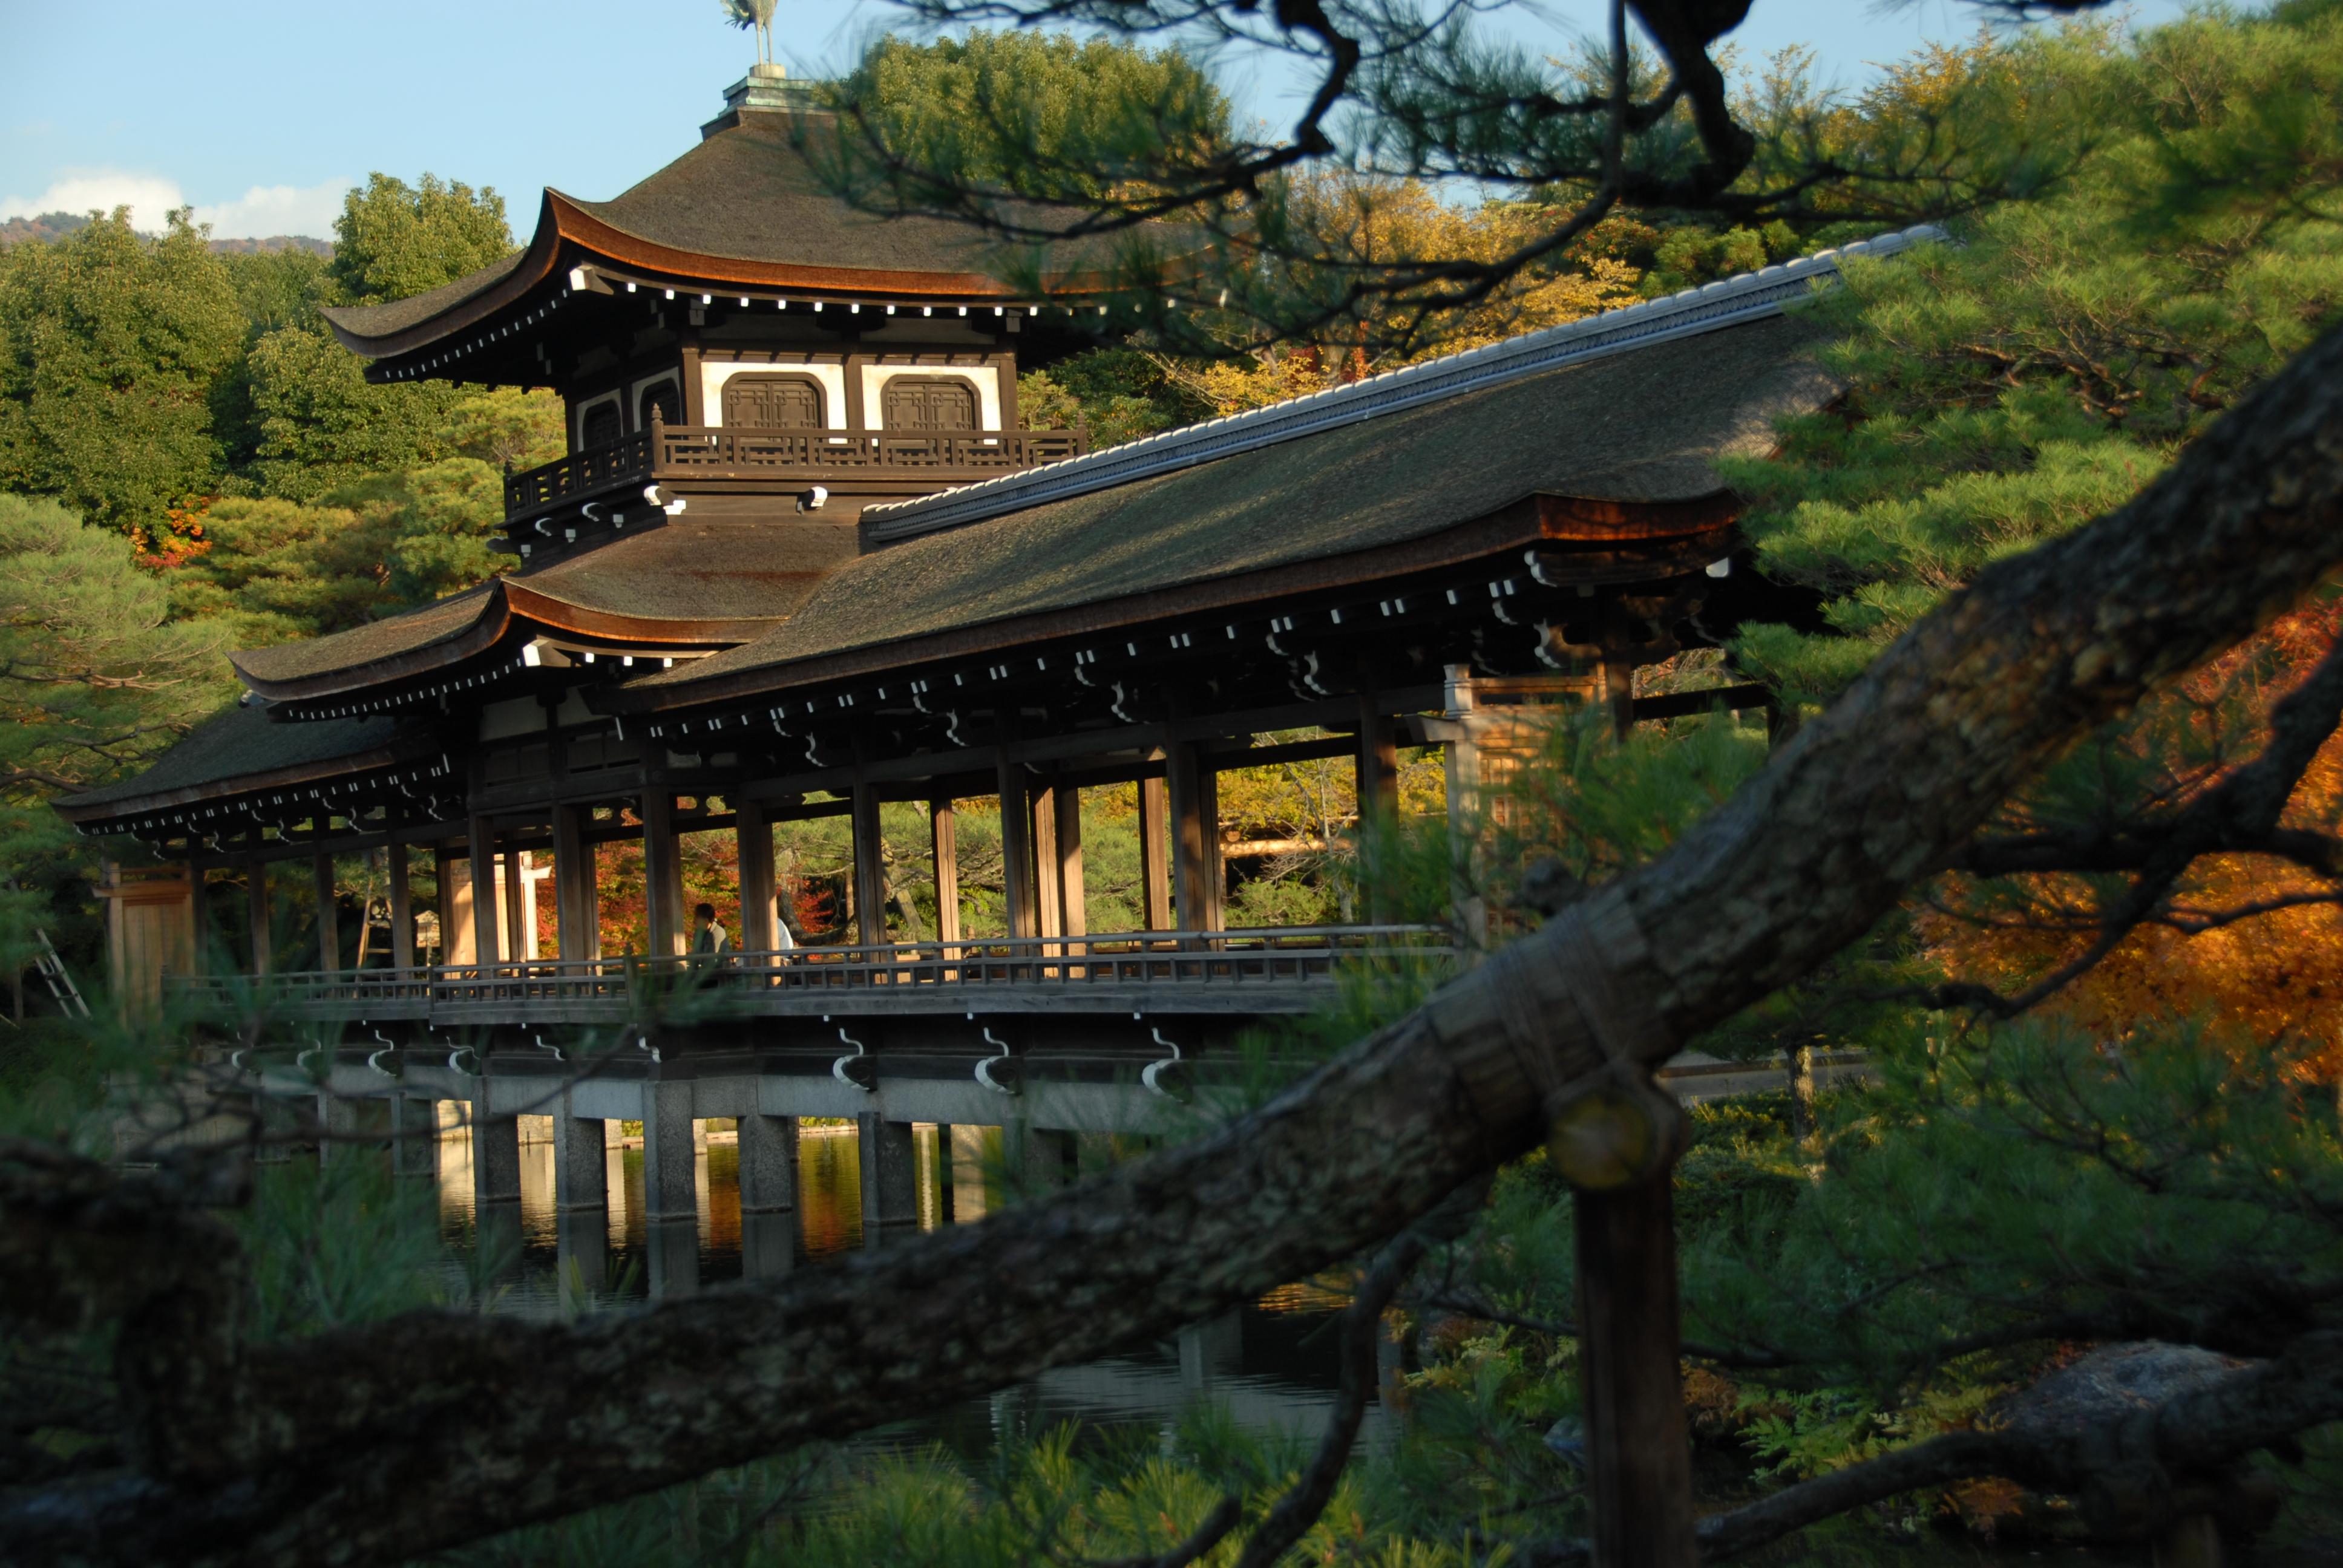 https://www.flickr.com/photos/69362954@N00/Rokuon ji deer garden temple kyoto autumn leaves japan